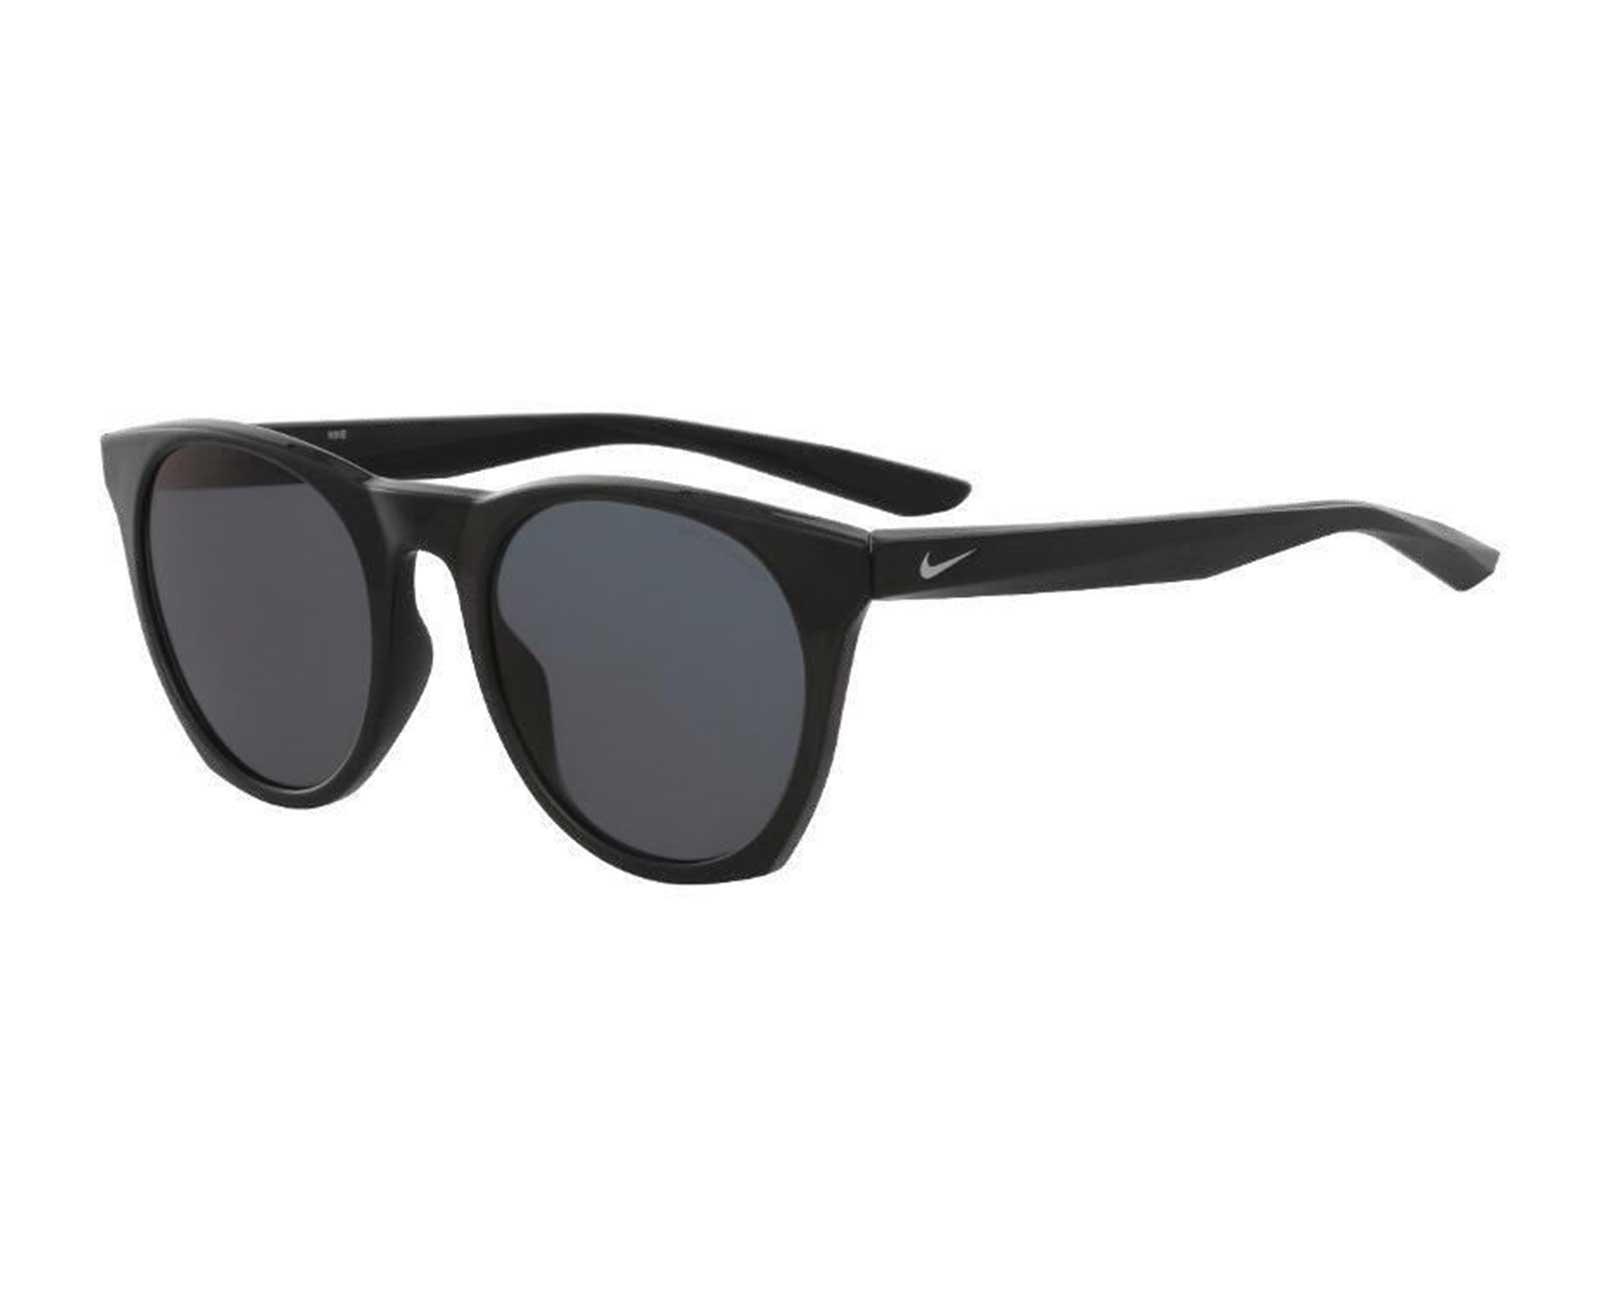 Nike Essential Horizon P EV1120 in Black/Silver